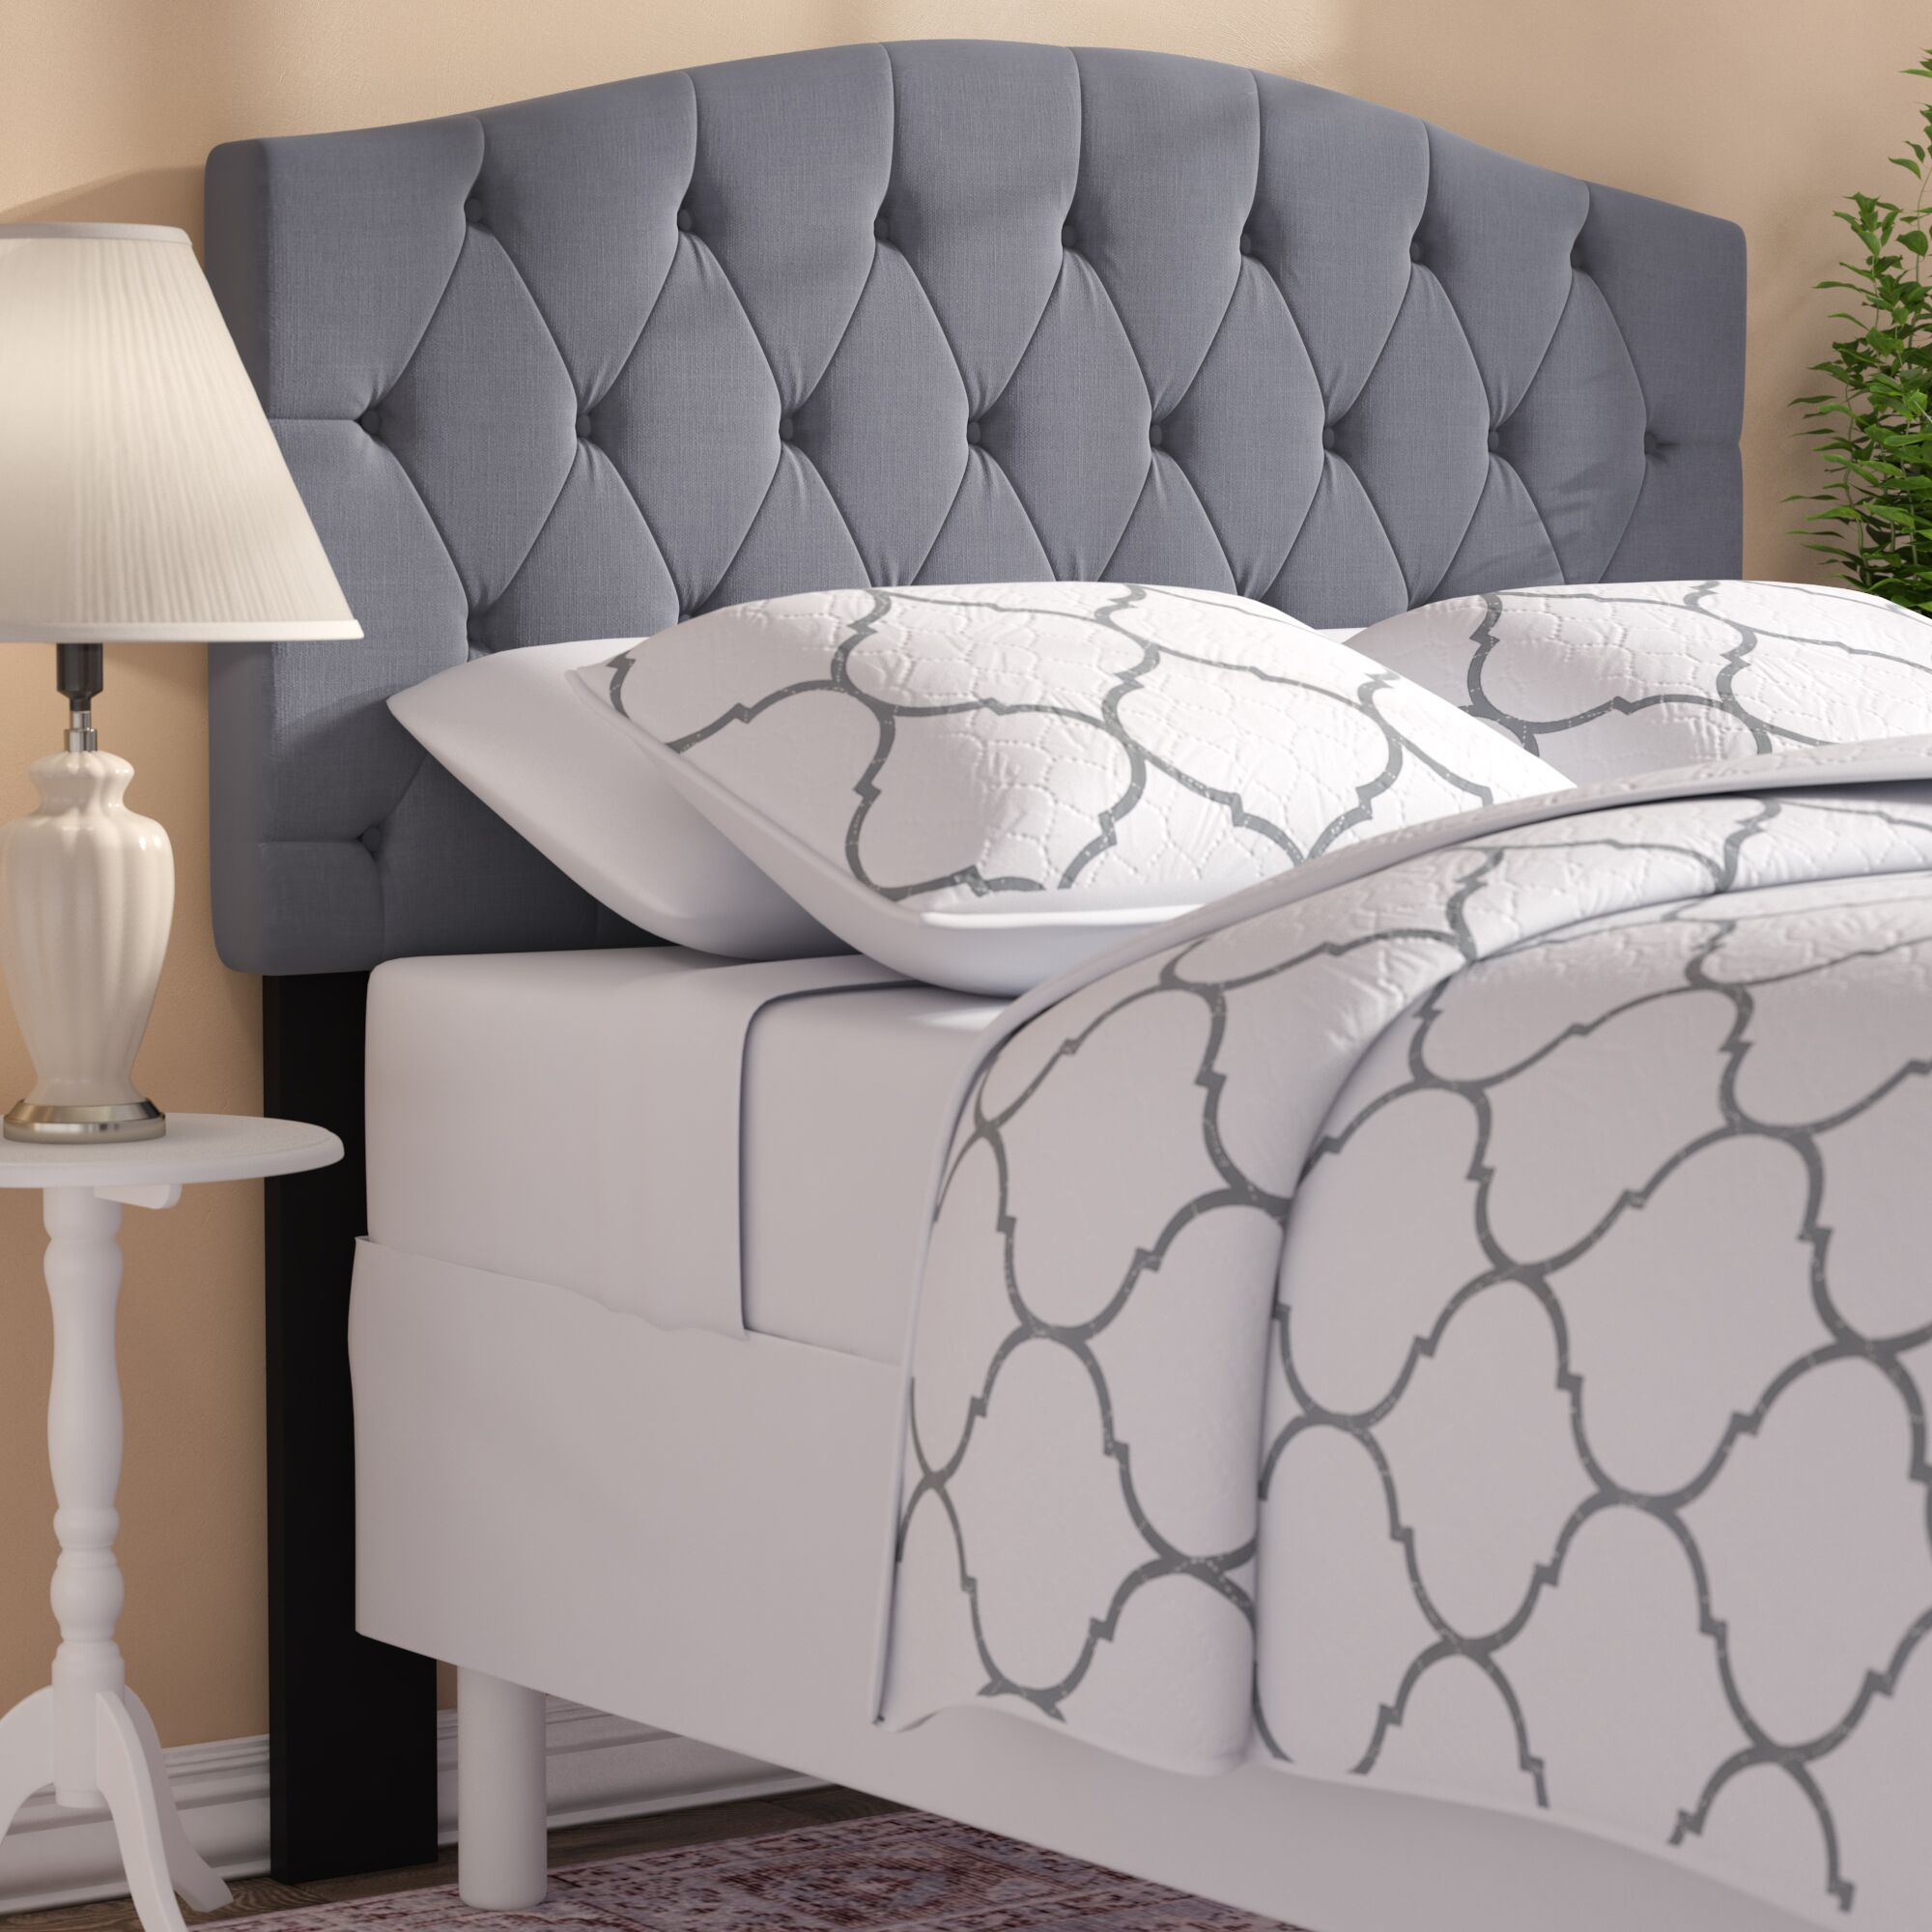 Buterbaugh Upholstered Panel Headboard Upholstery: Dark Mocha Brown, Size: Twin